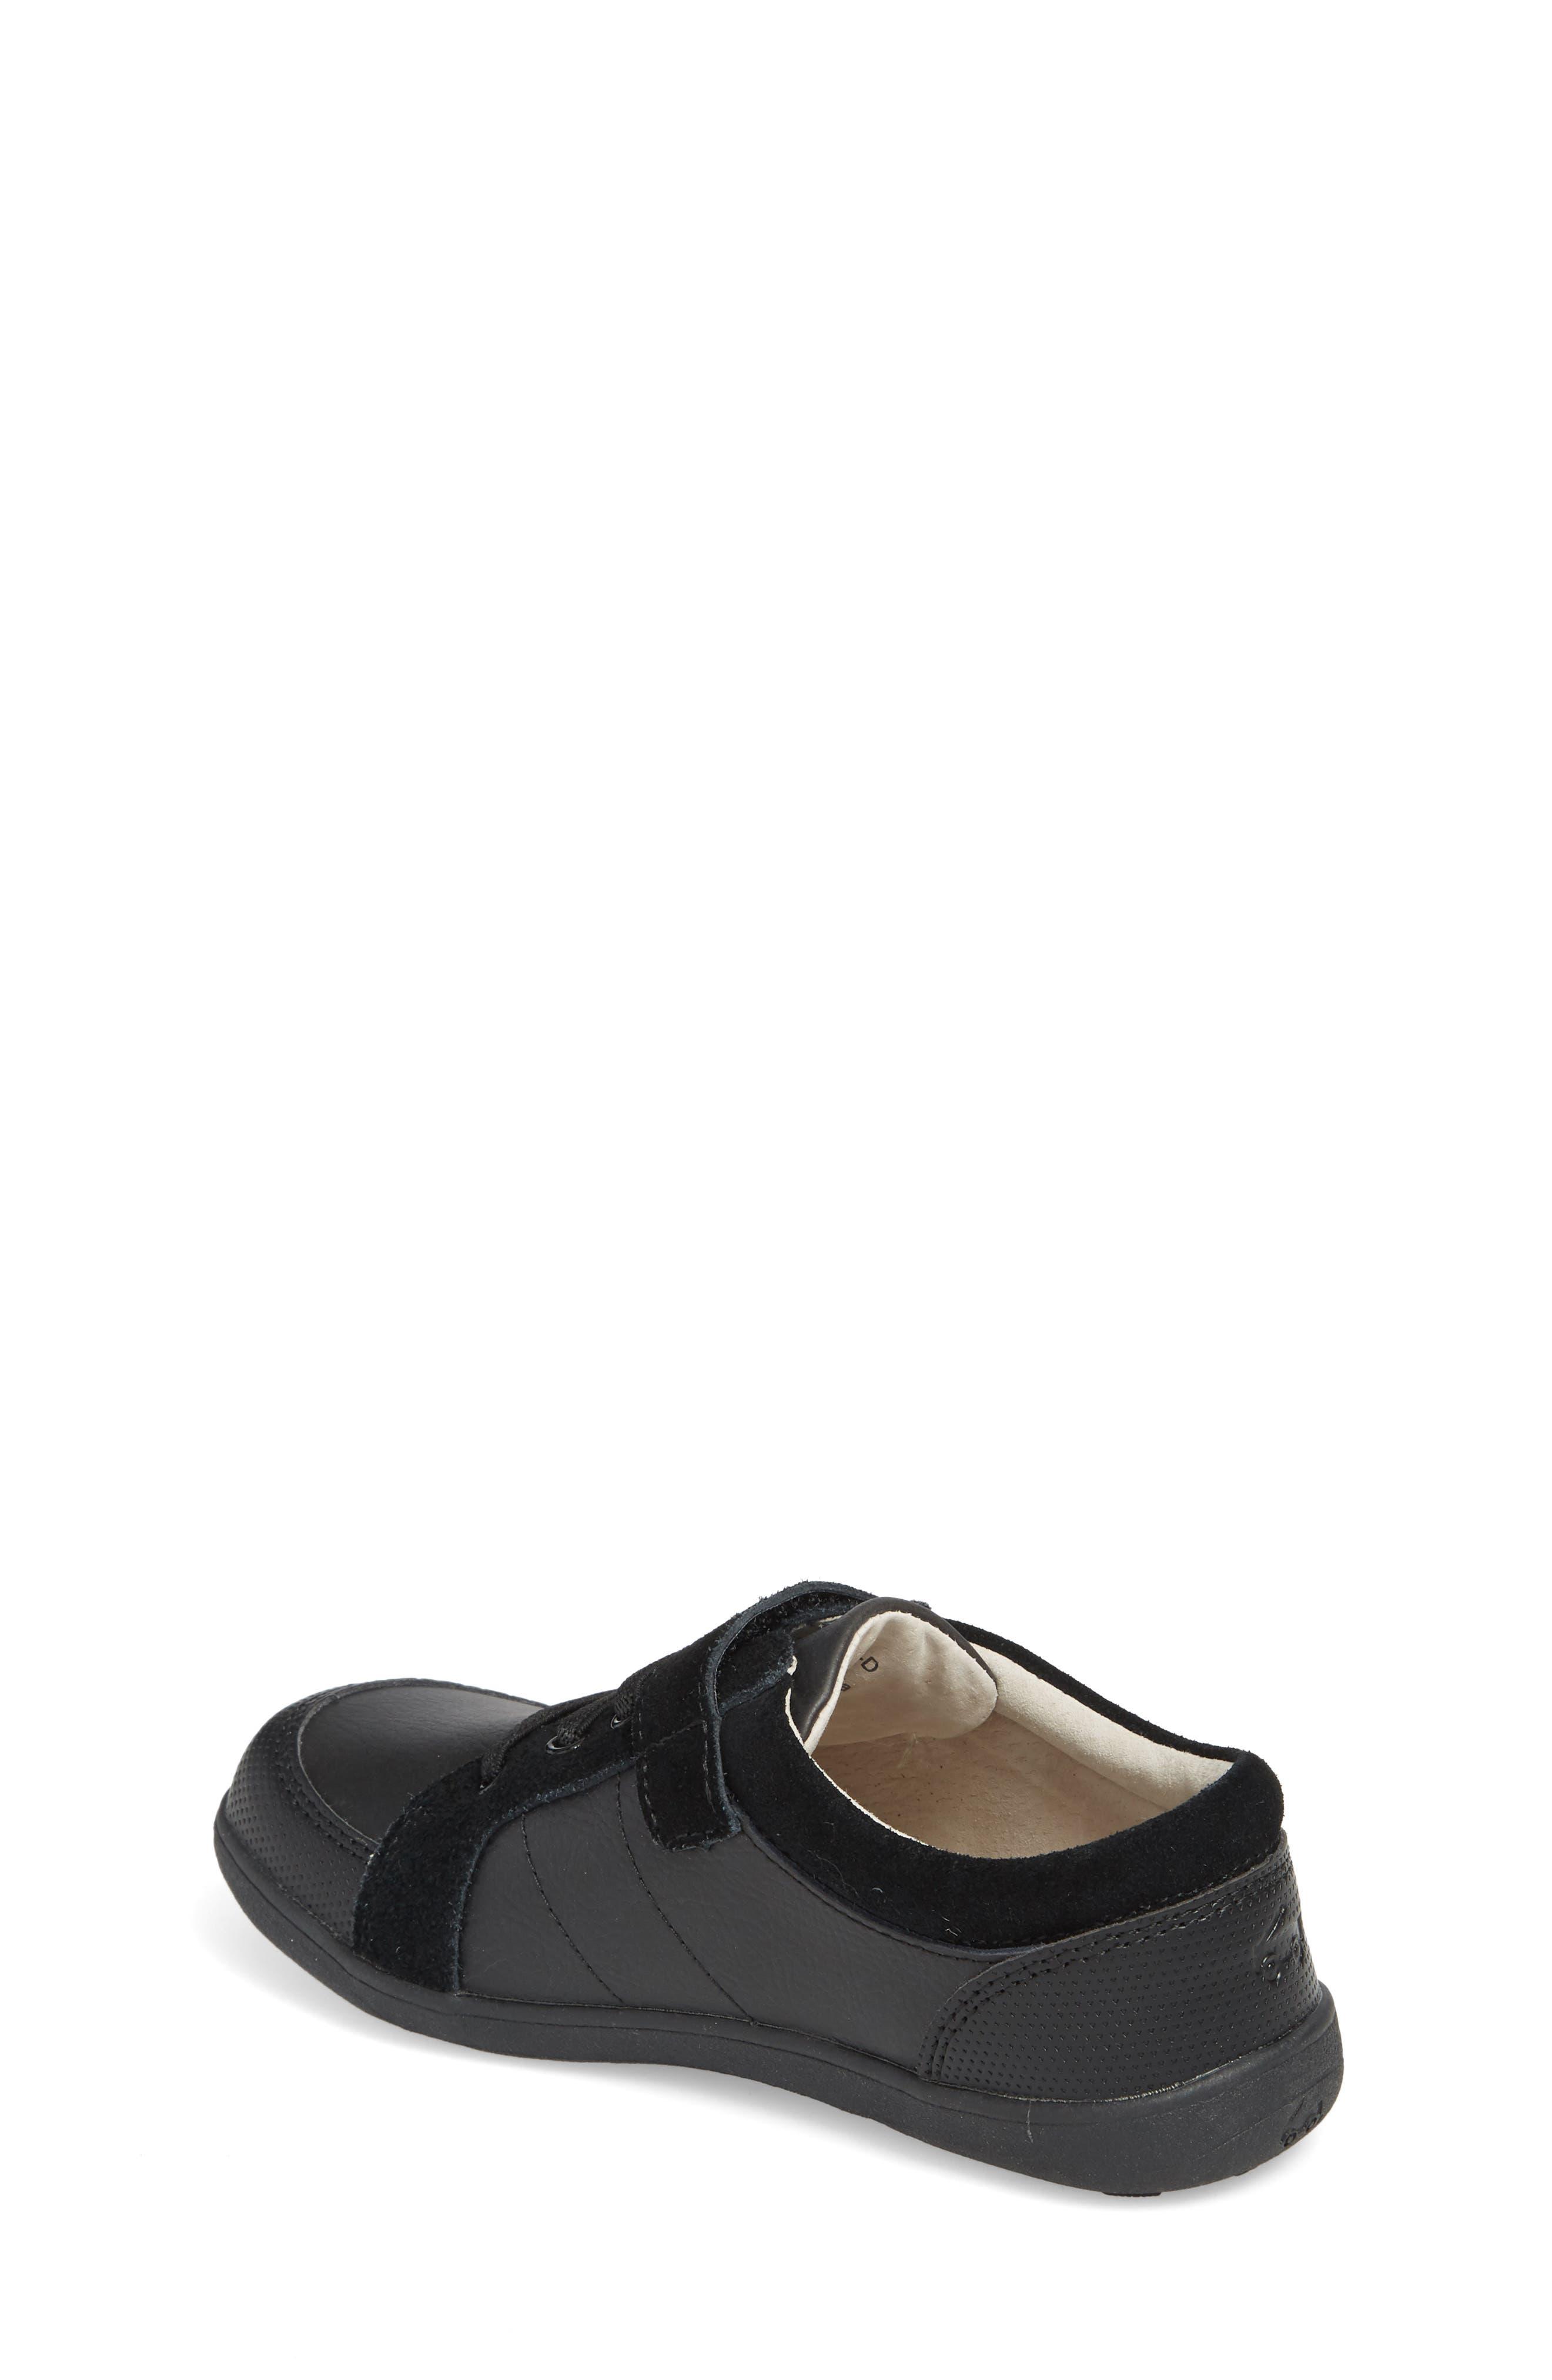 Randal III Sneaker,                             Alternate thumbnail 2, color,                             Black